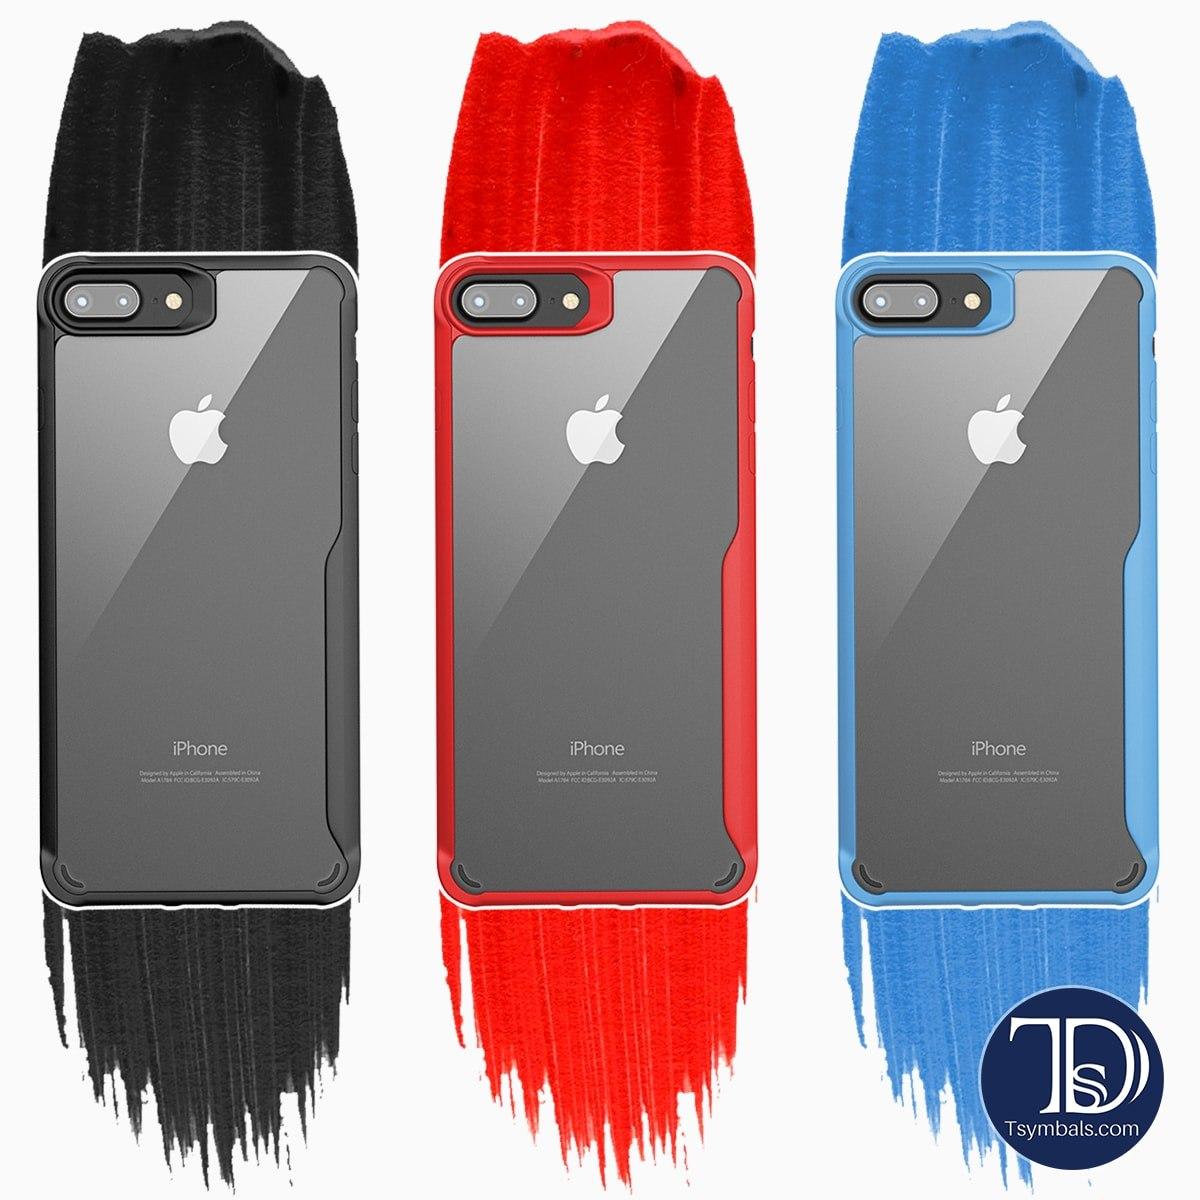 Phone cases 01